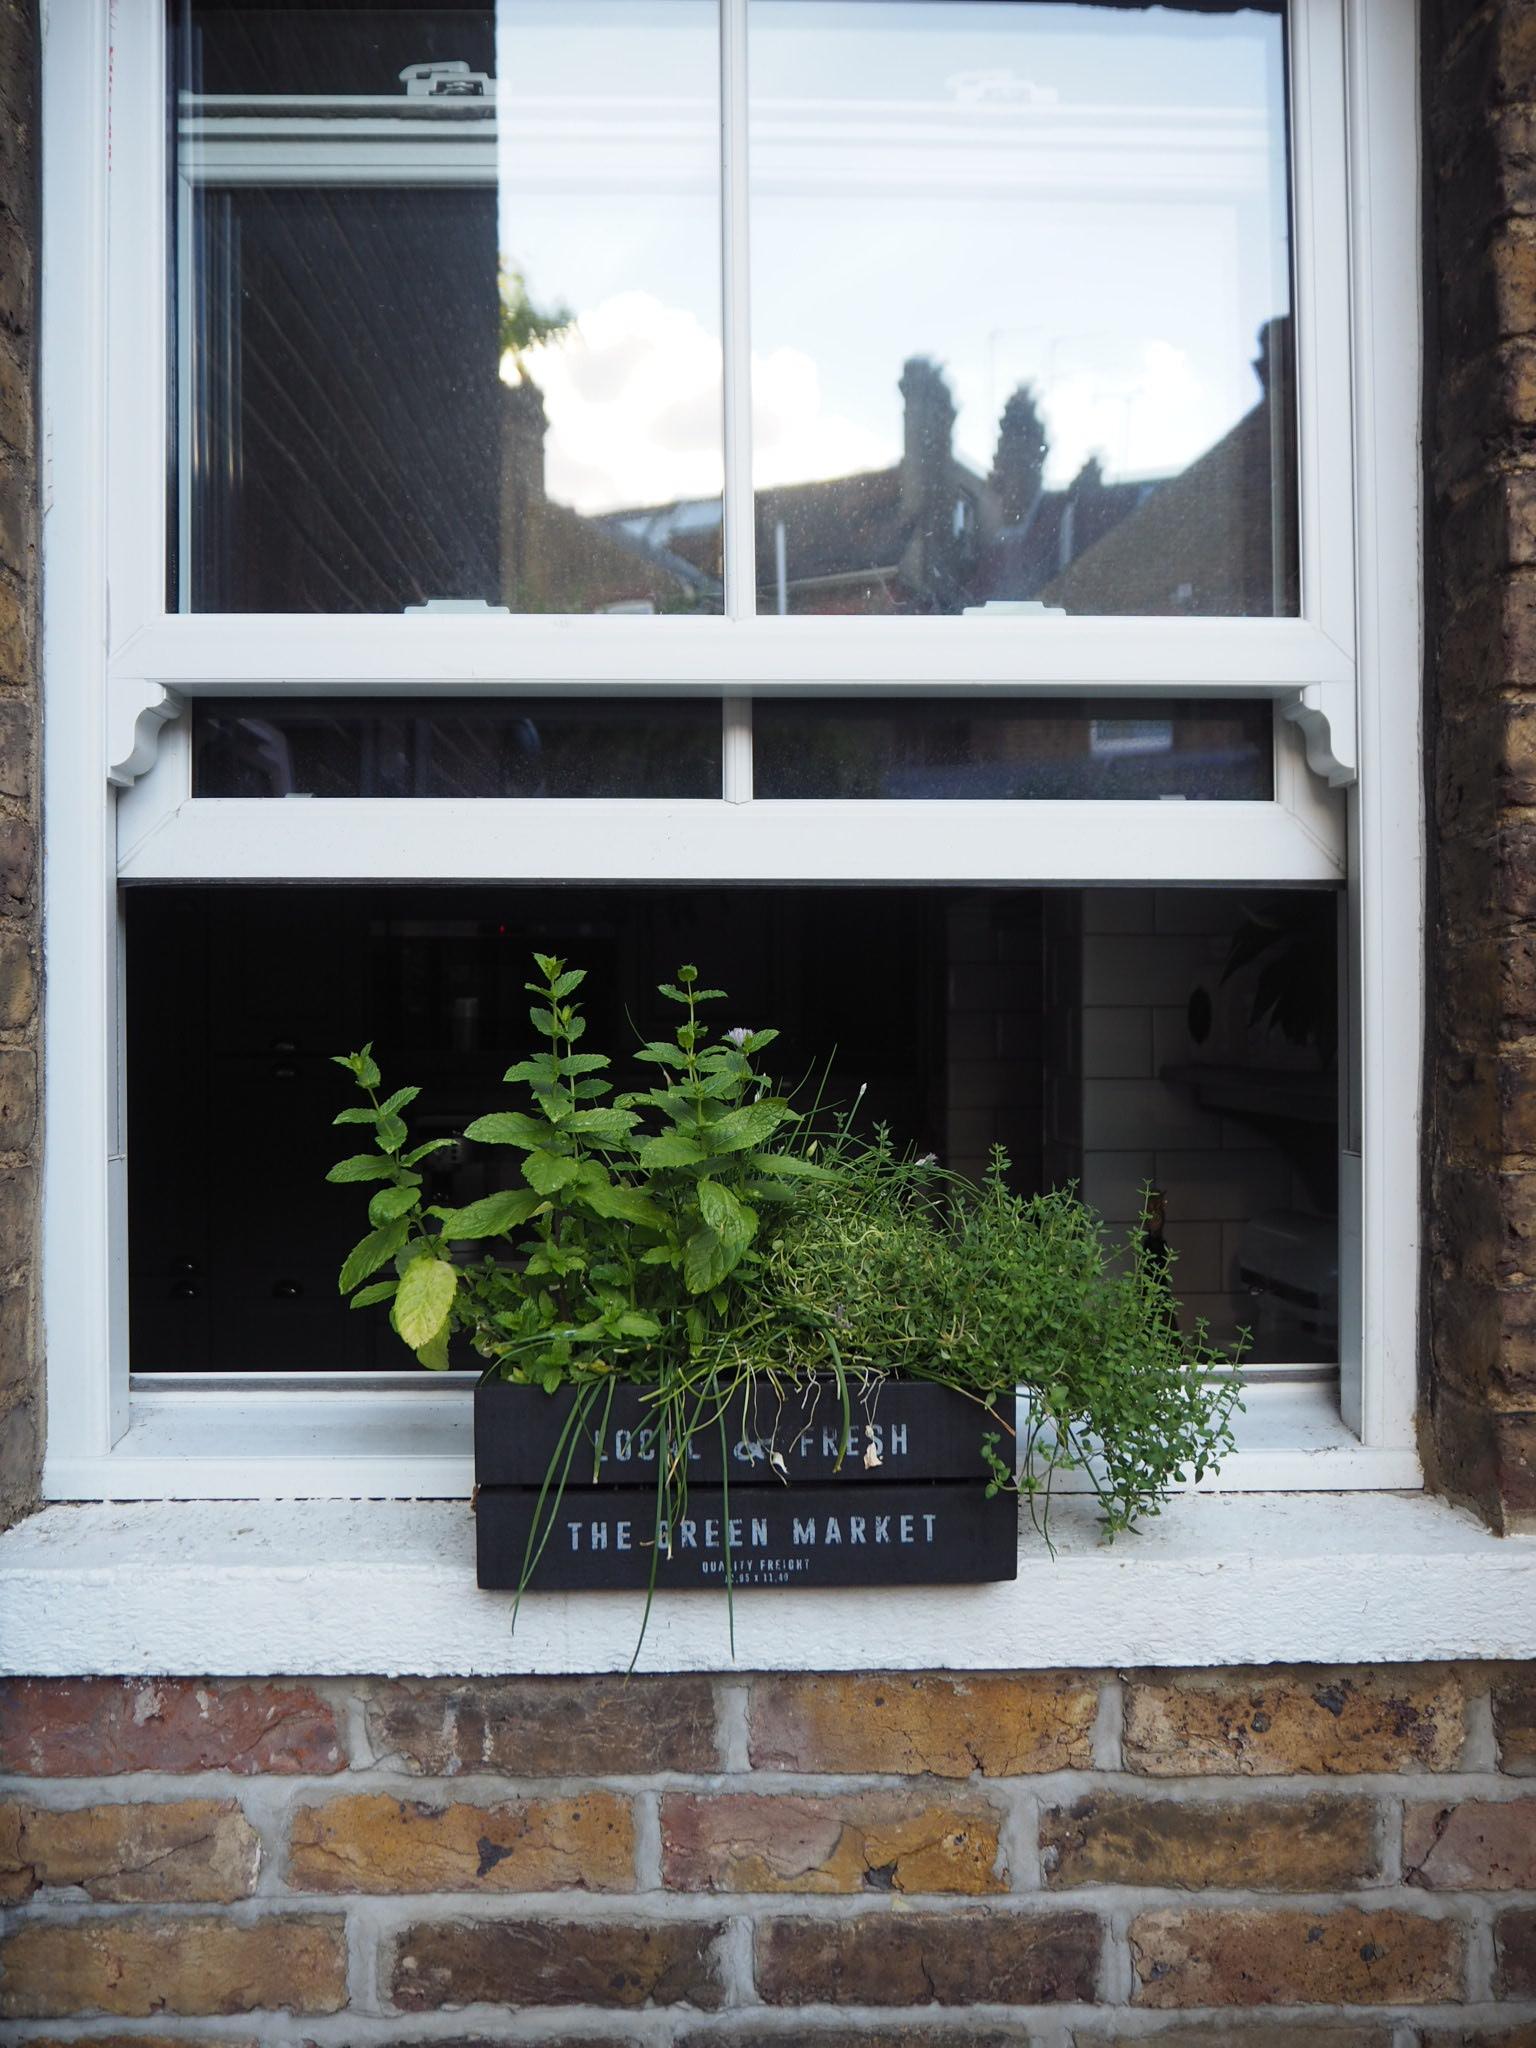 Everyone needs a herb window box like this.